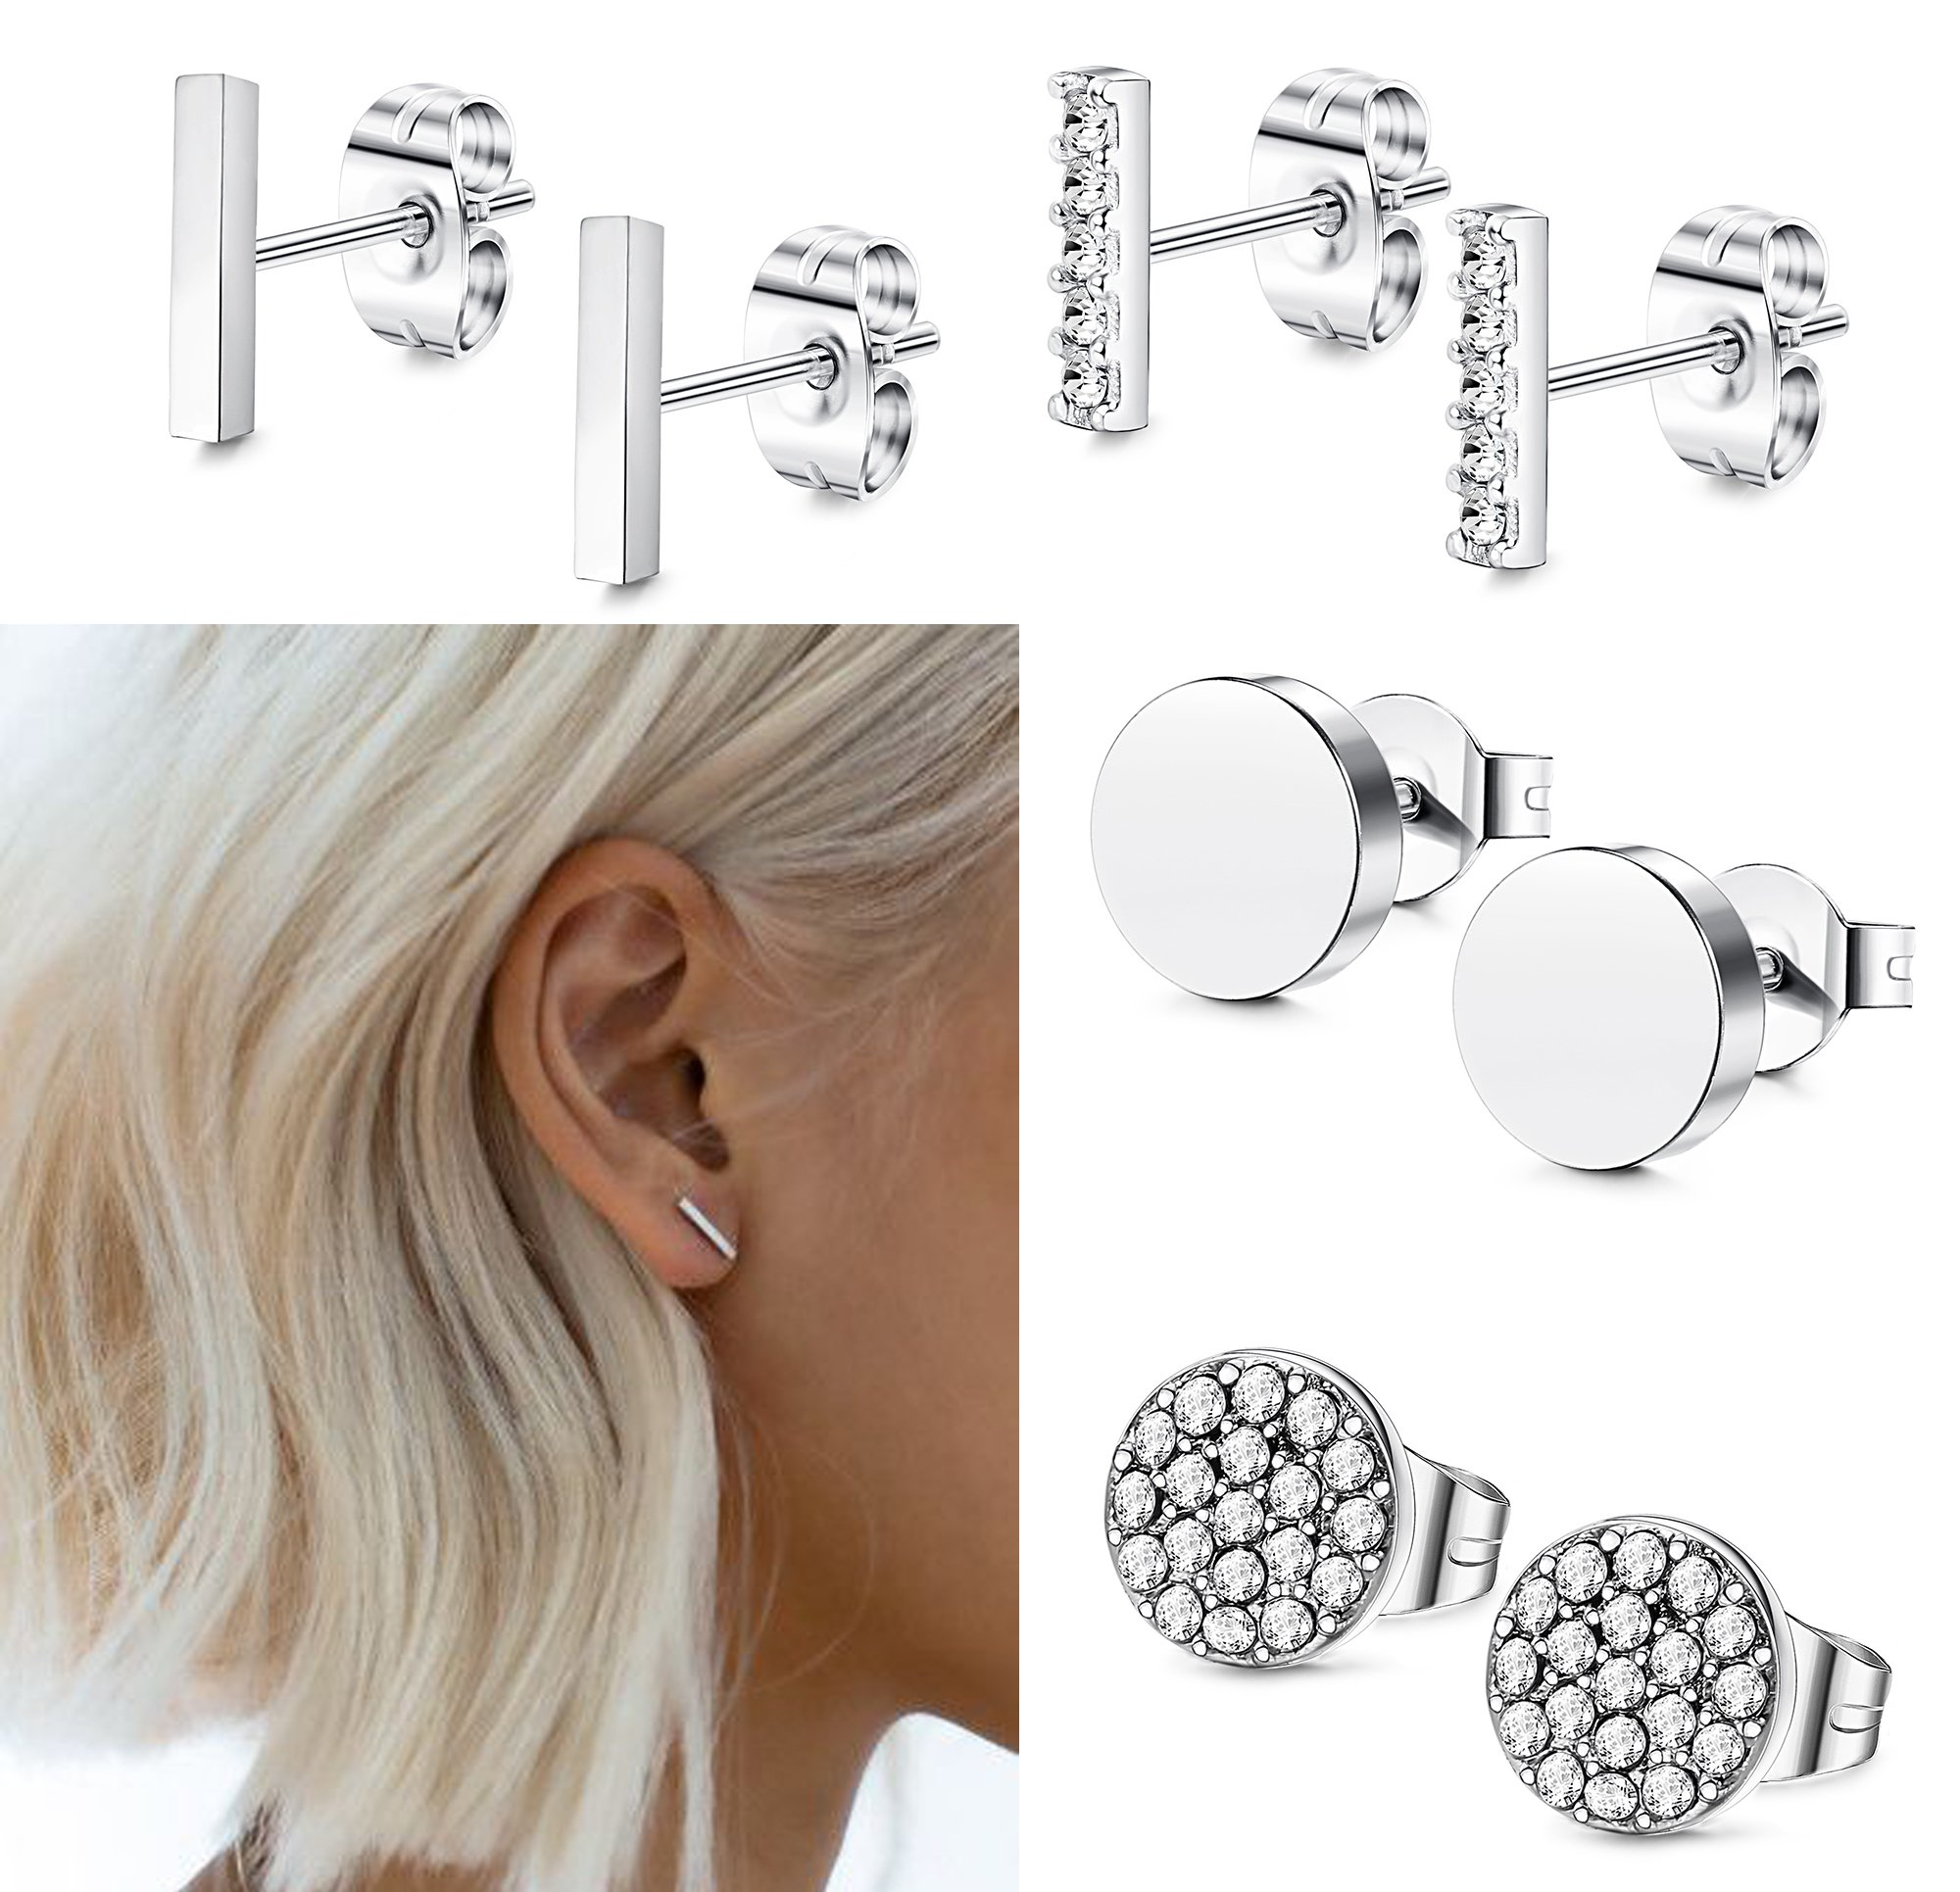 FIBO STEEL Stainless Steel CZ Bar Stud Earrings for Men Women Girls Silver-tone